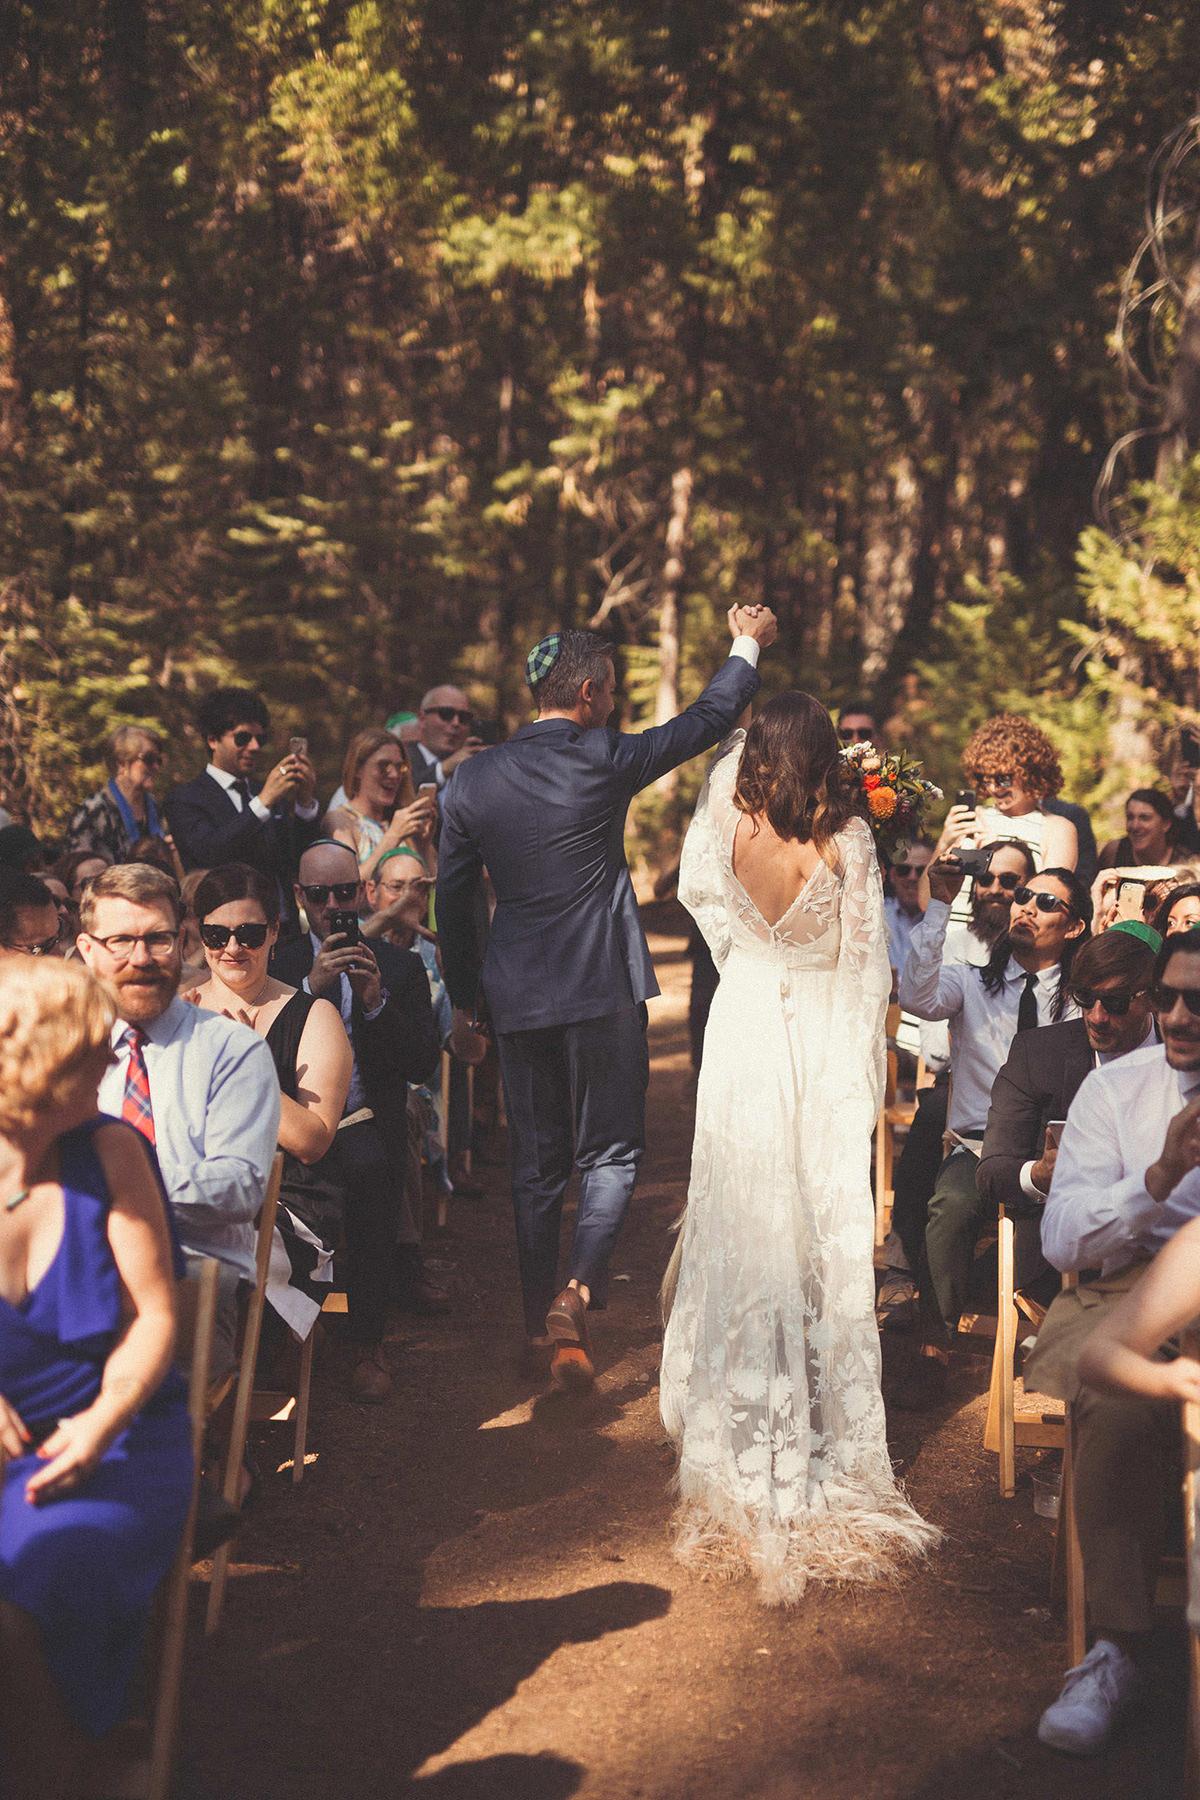 S&J - Wedding Photography Yosemite National Park SJ Wedding Photography Yosemite 093